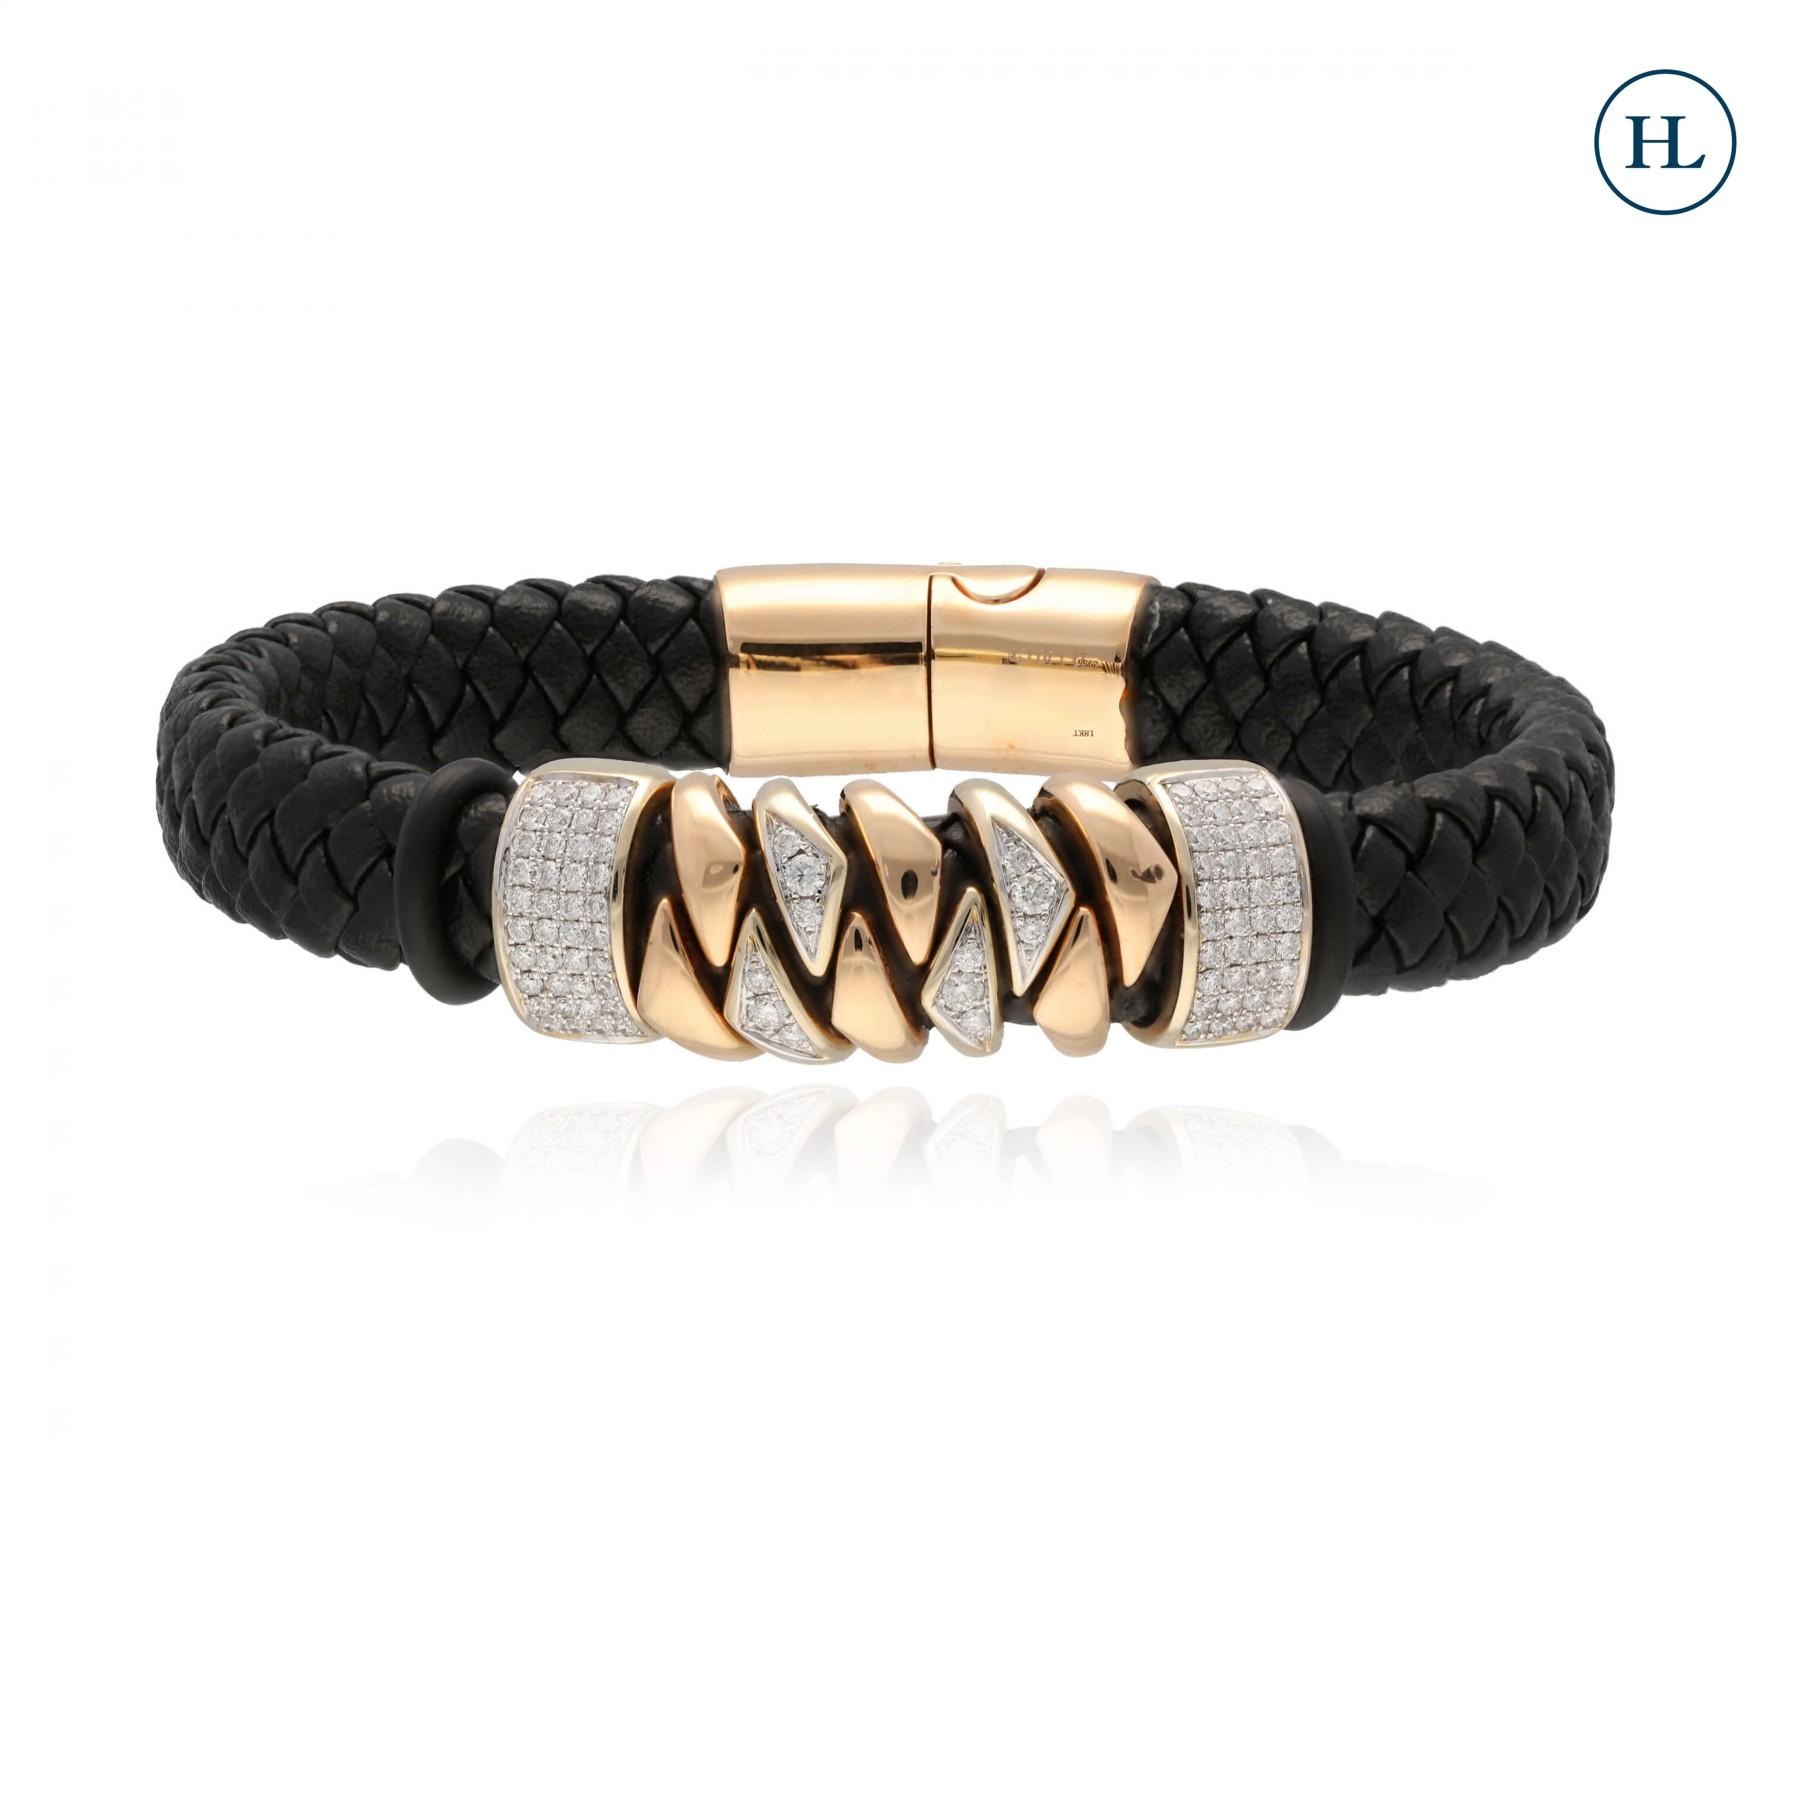 Diamond & Leather Bracelet